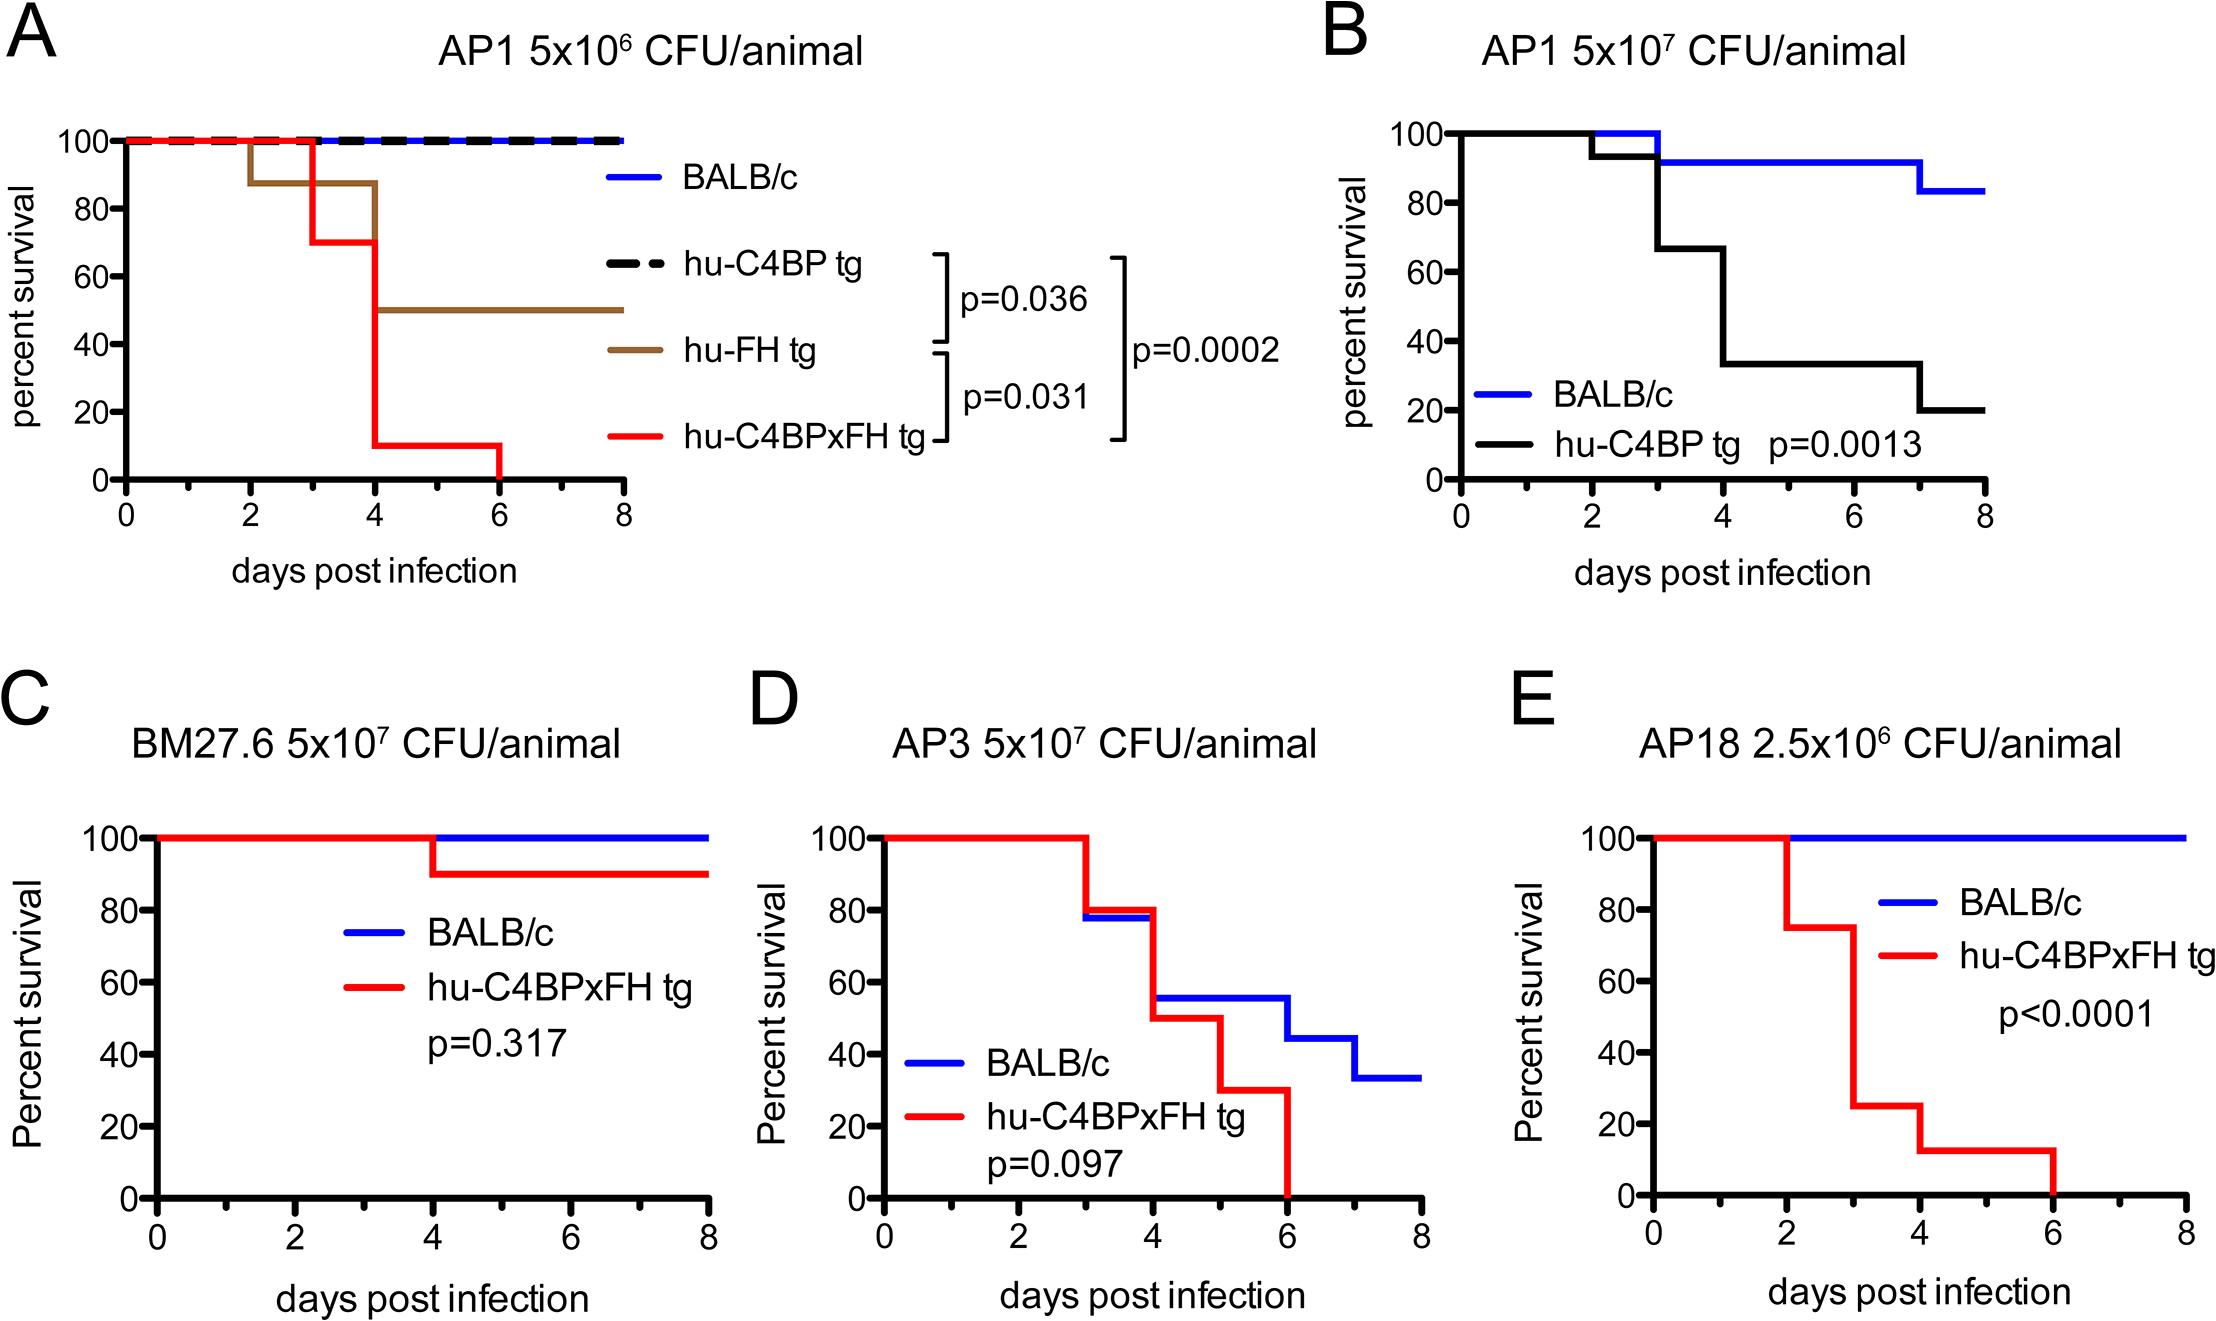 Human complement inhibitors worsen GAS AP1 infection.